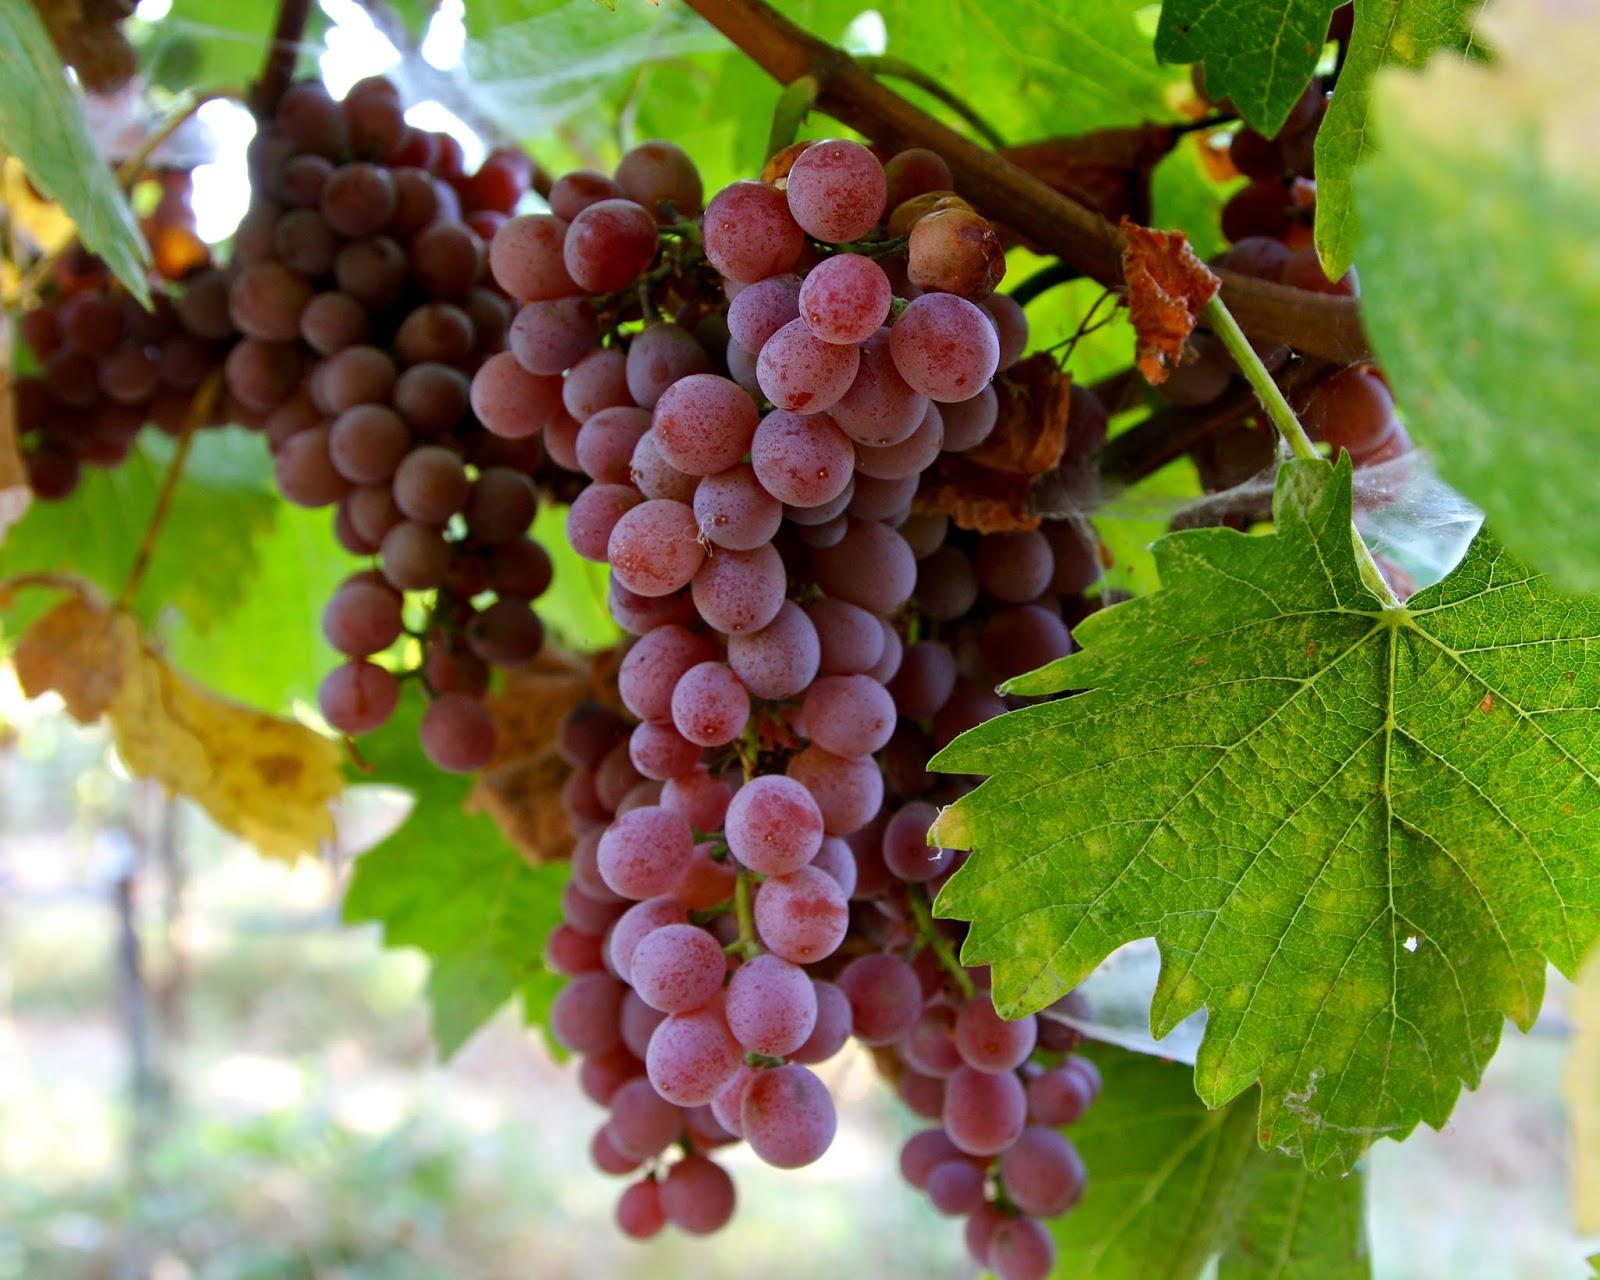 ярких фото винограда мускат розовый берегу